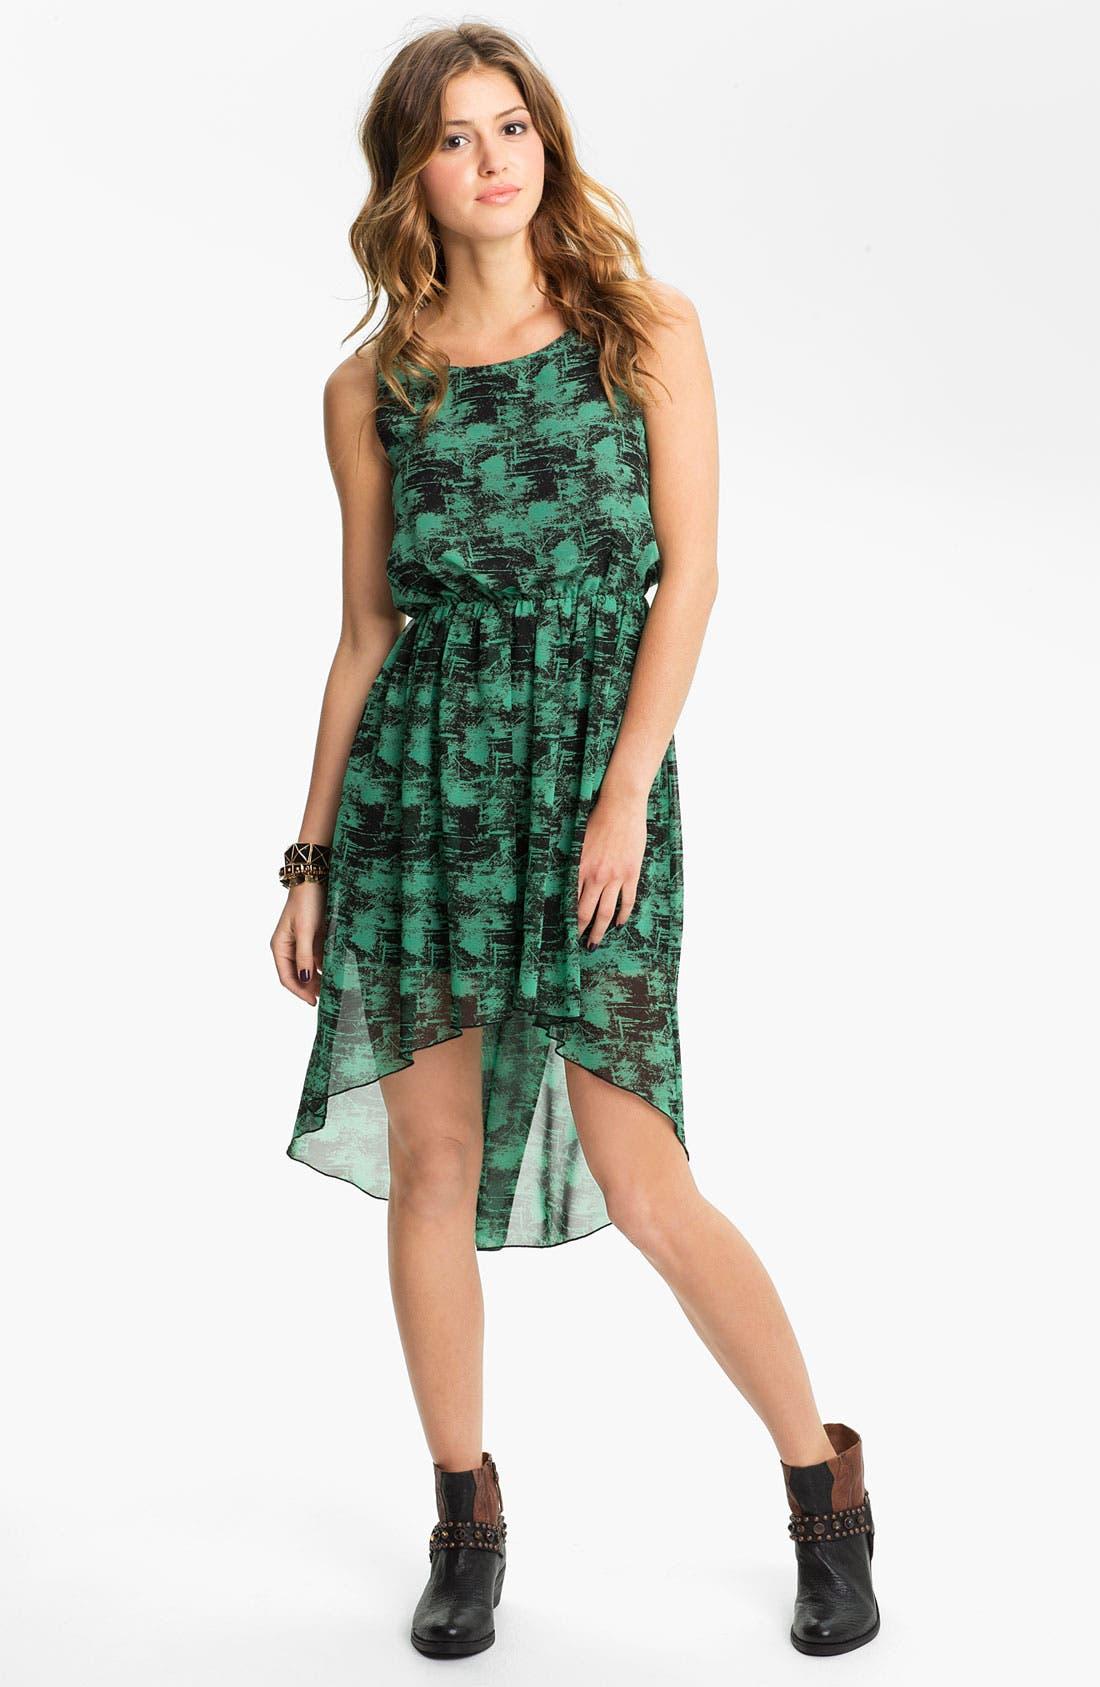 Alternate Image 1 Selected - Soprano High/Low Print Chiffon Dress (Juniors)